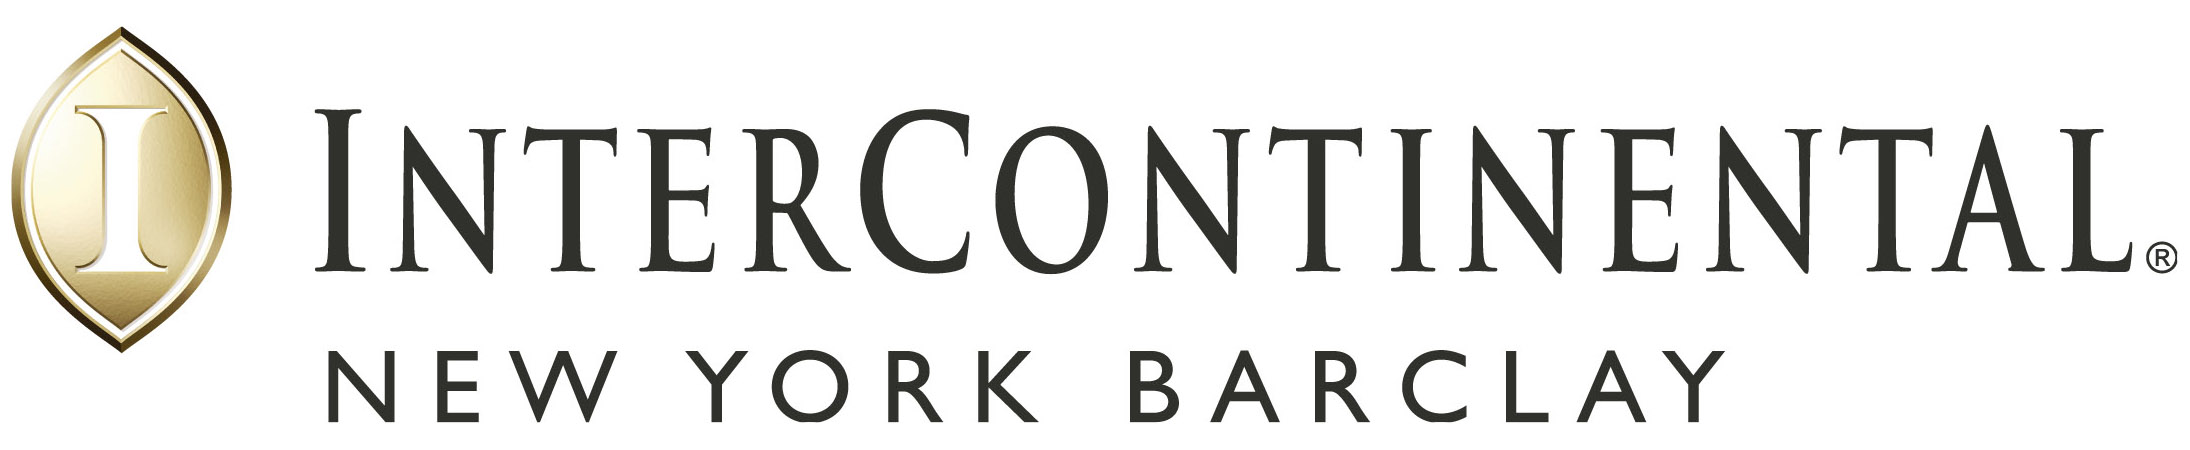 Intercontinental Barclay